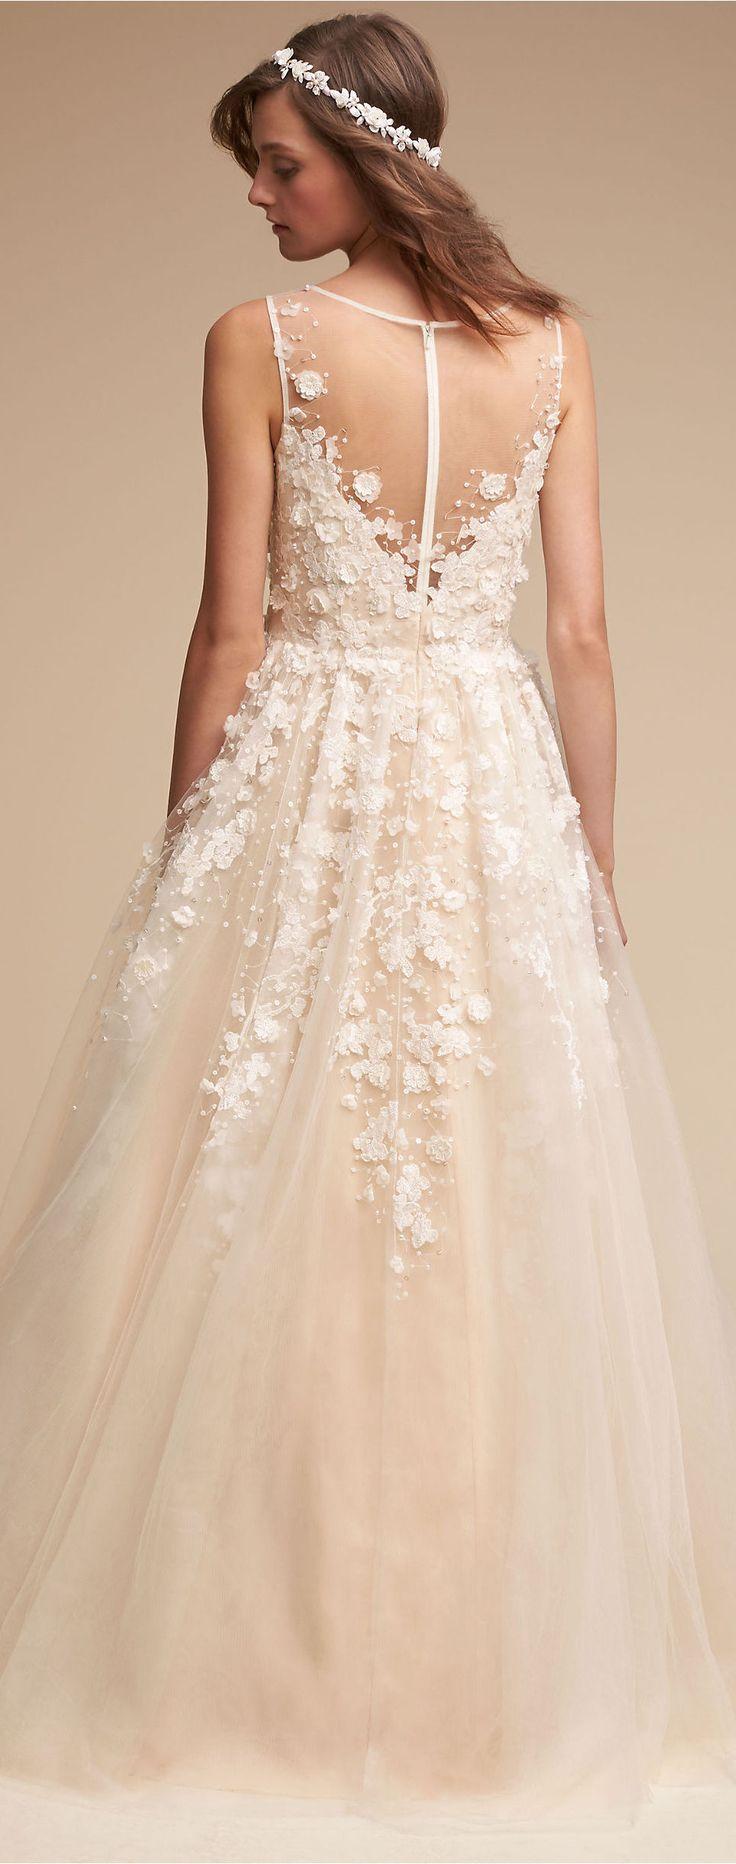 4861 best Novia y novio images on Pinterest   Gown wedding ...